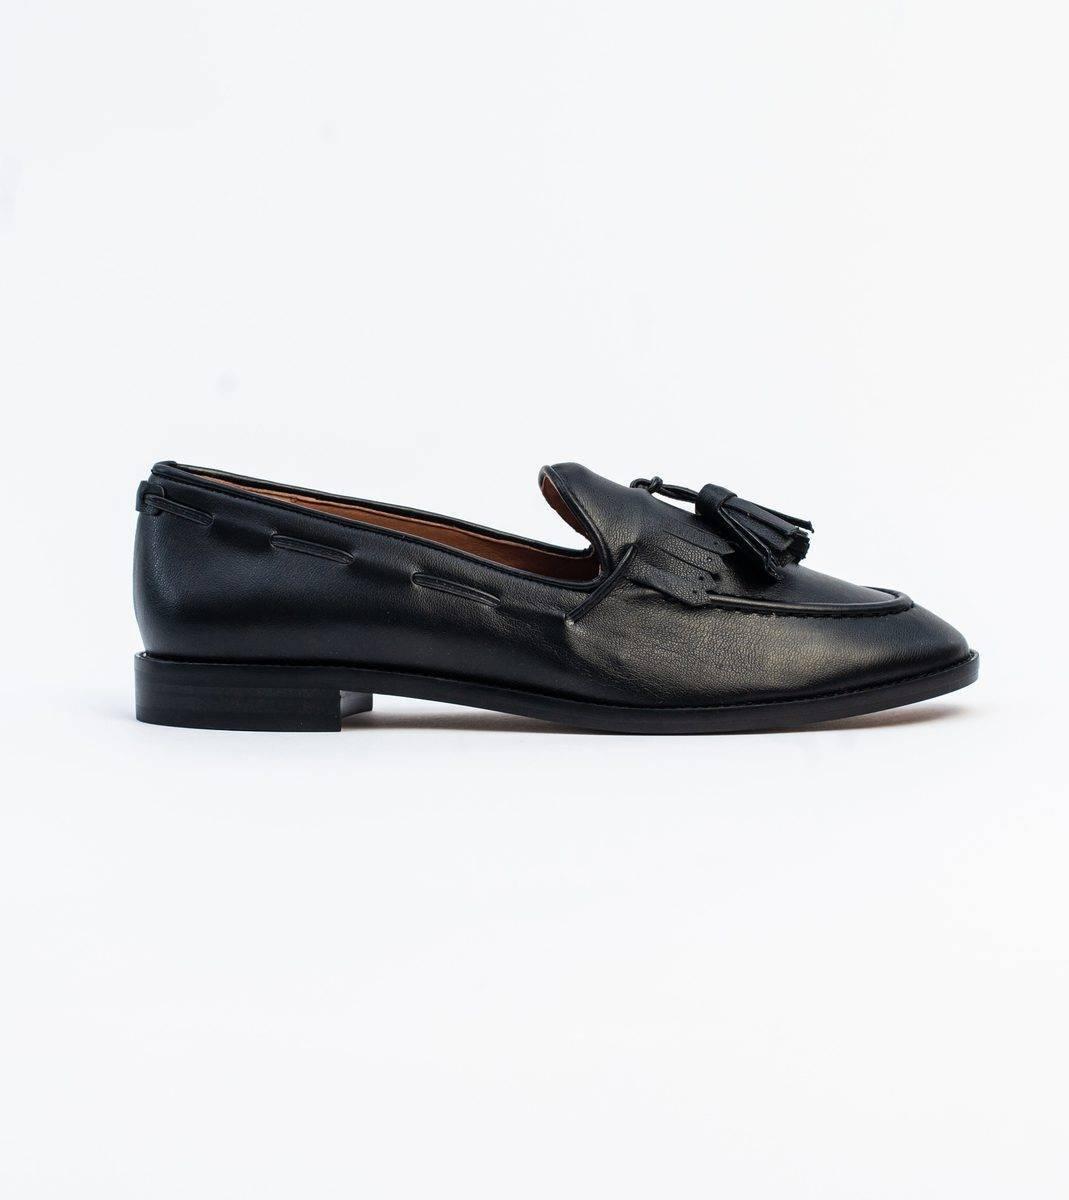 Alice Black Vegan Leather Tassel Loafer